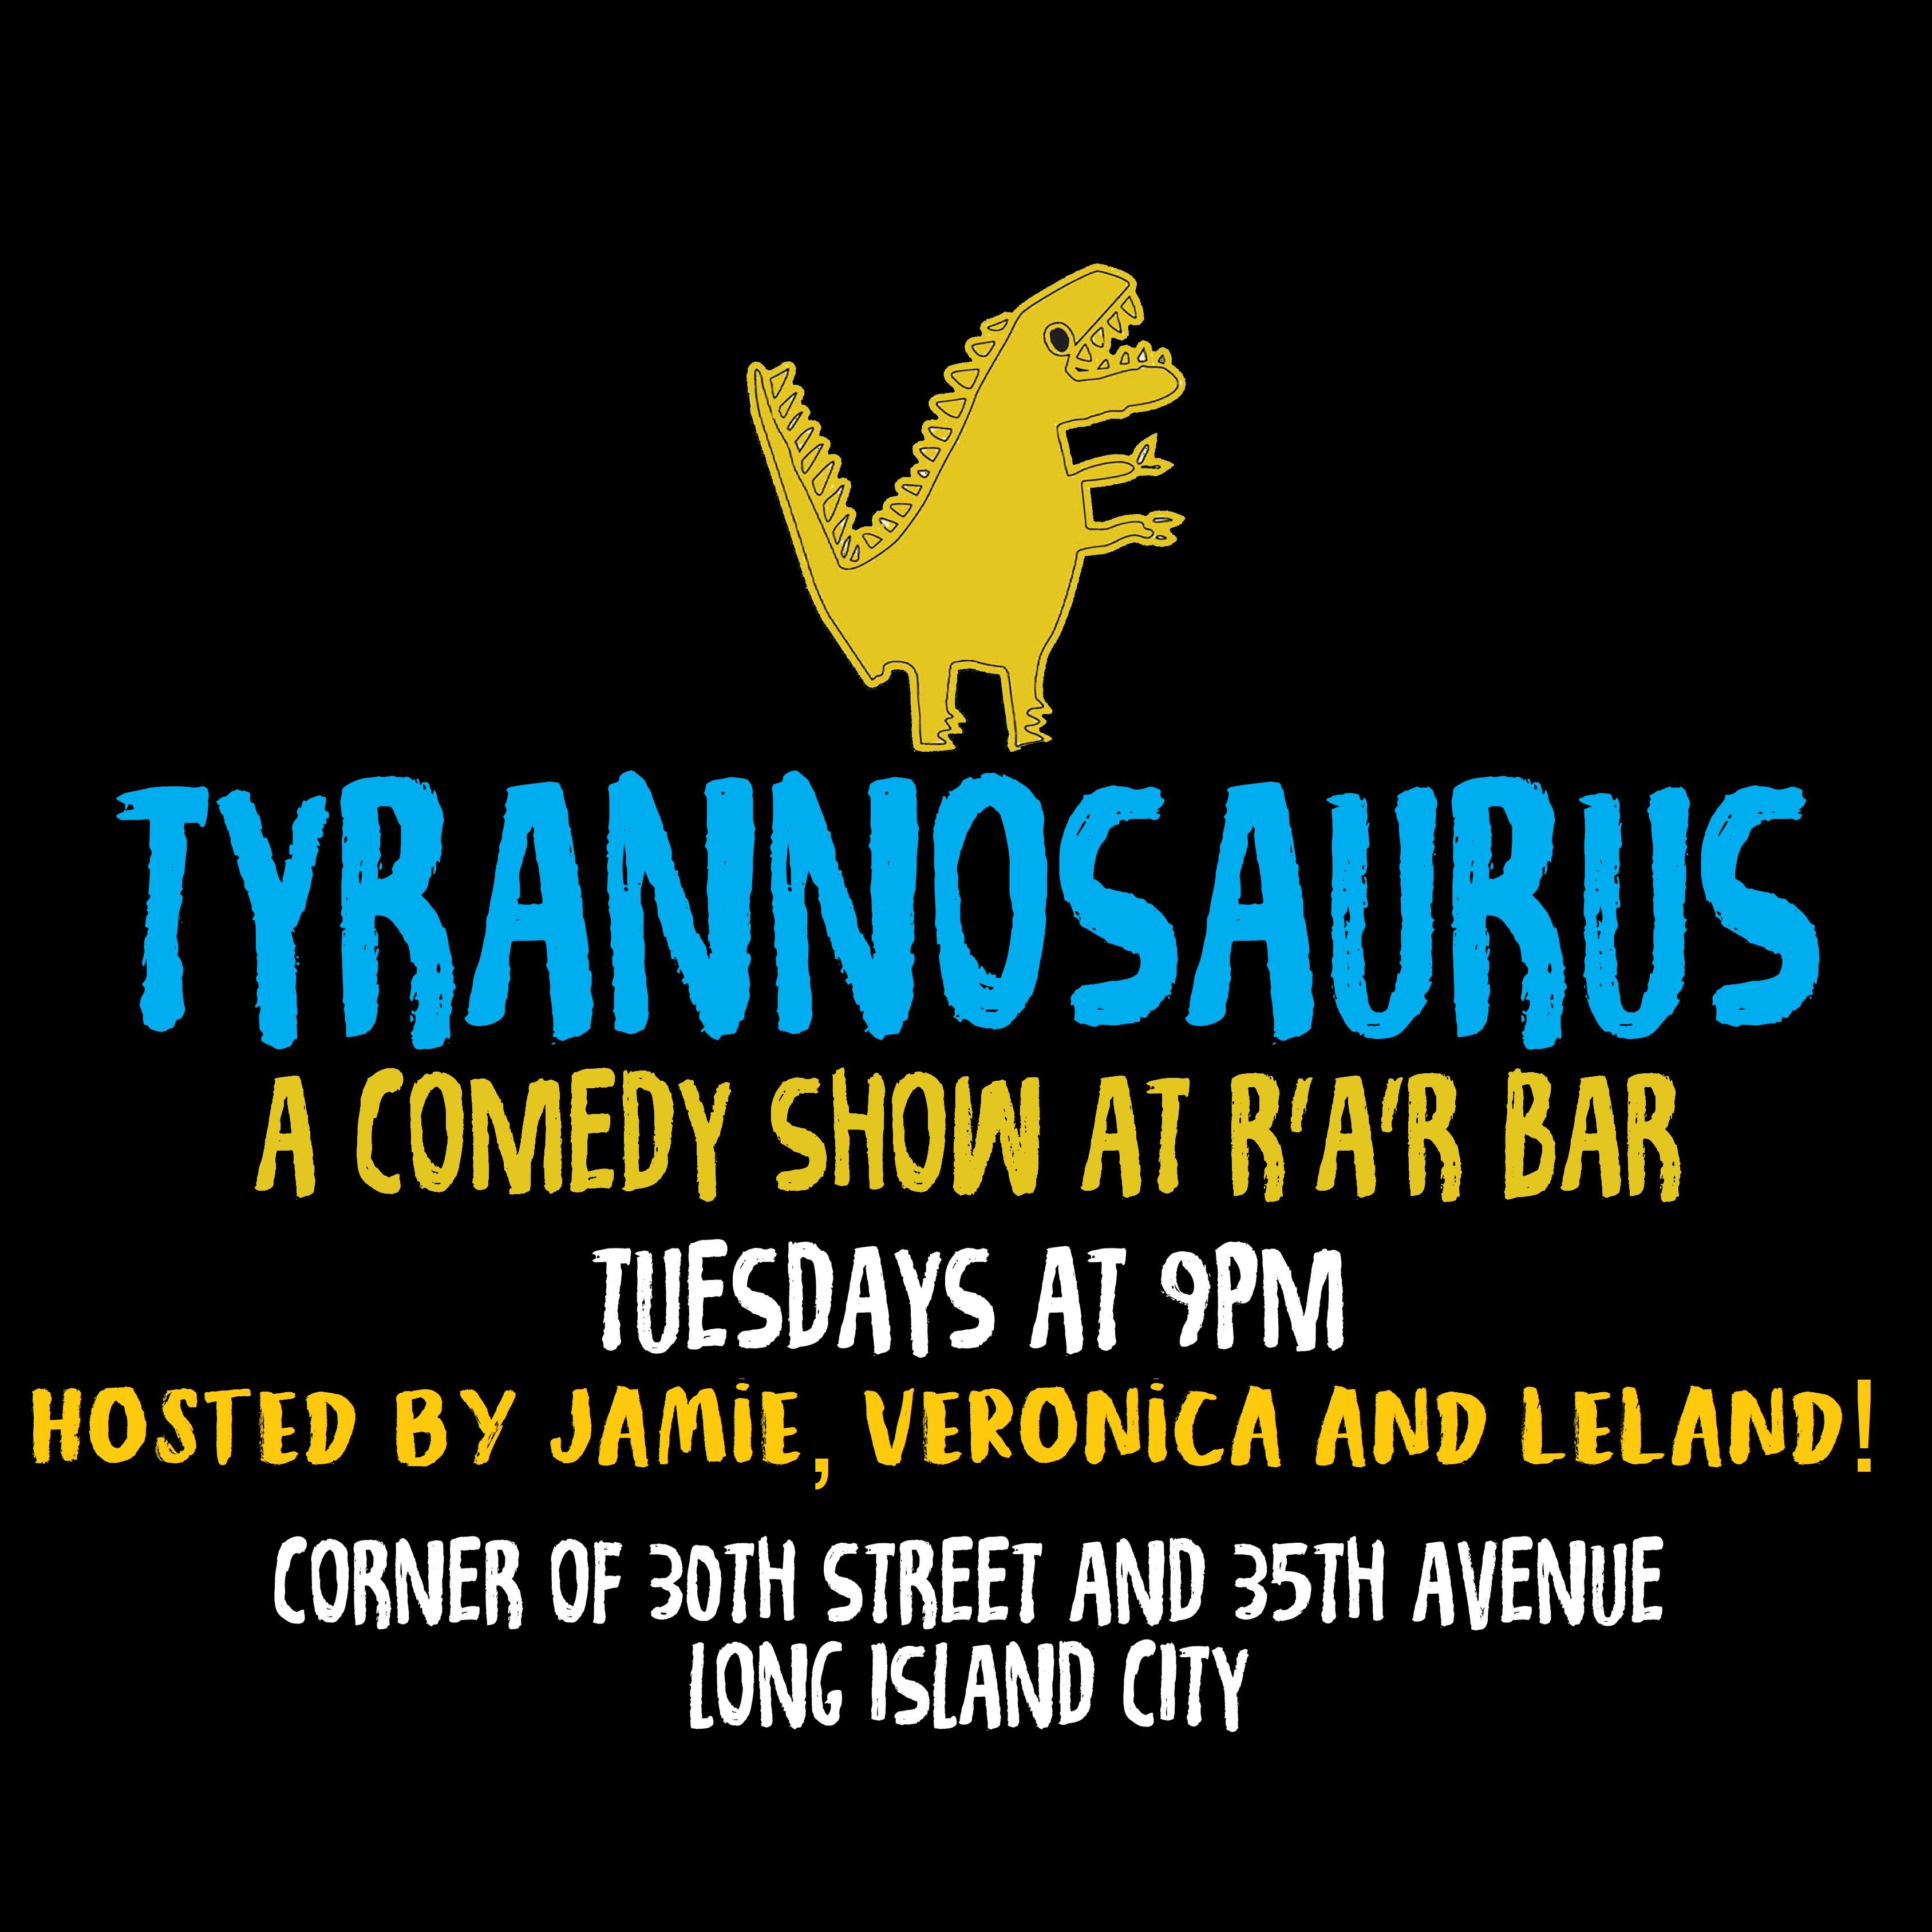 tyrannosaurus comedy poster